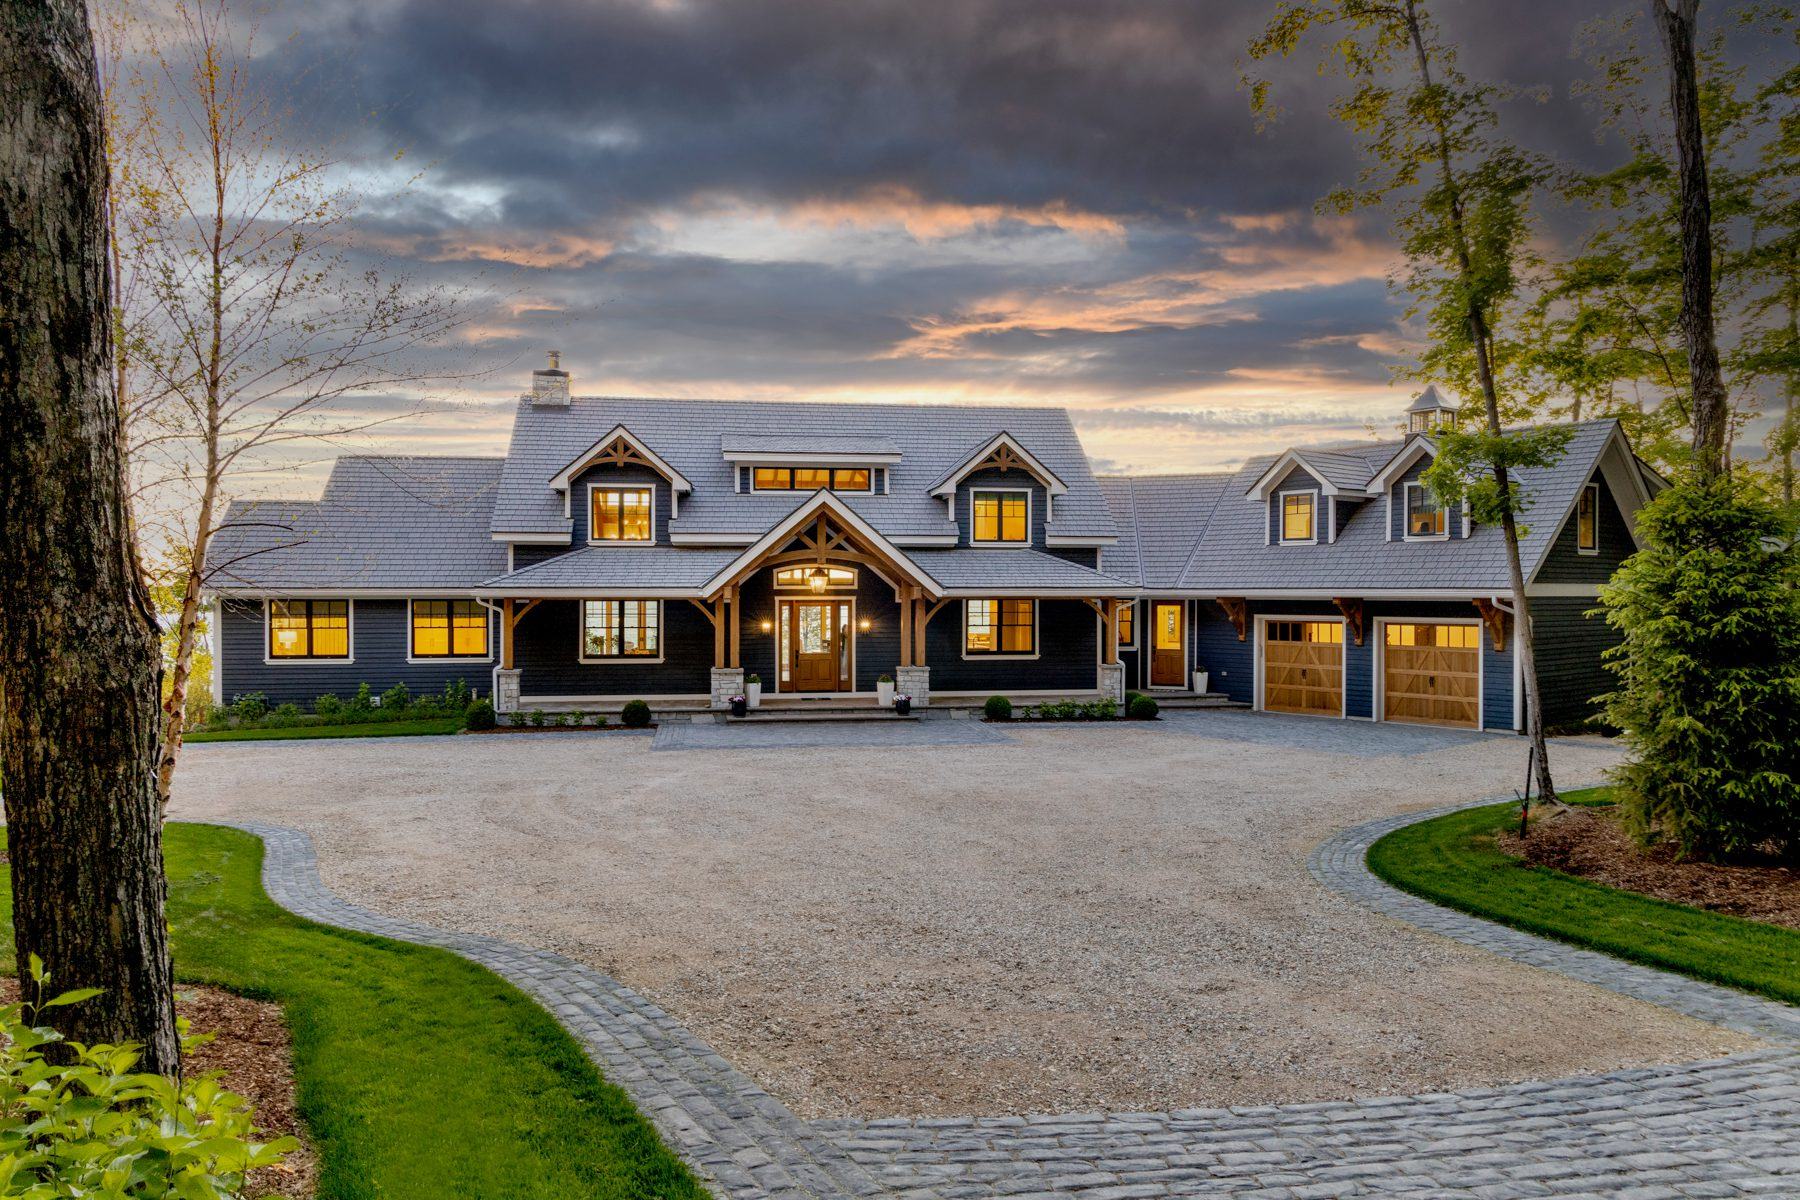 Custom Beachside Home | Timber Frame Homes | Normerica | Exterior, Front View, Evening, Garage